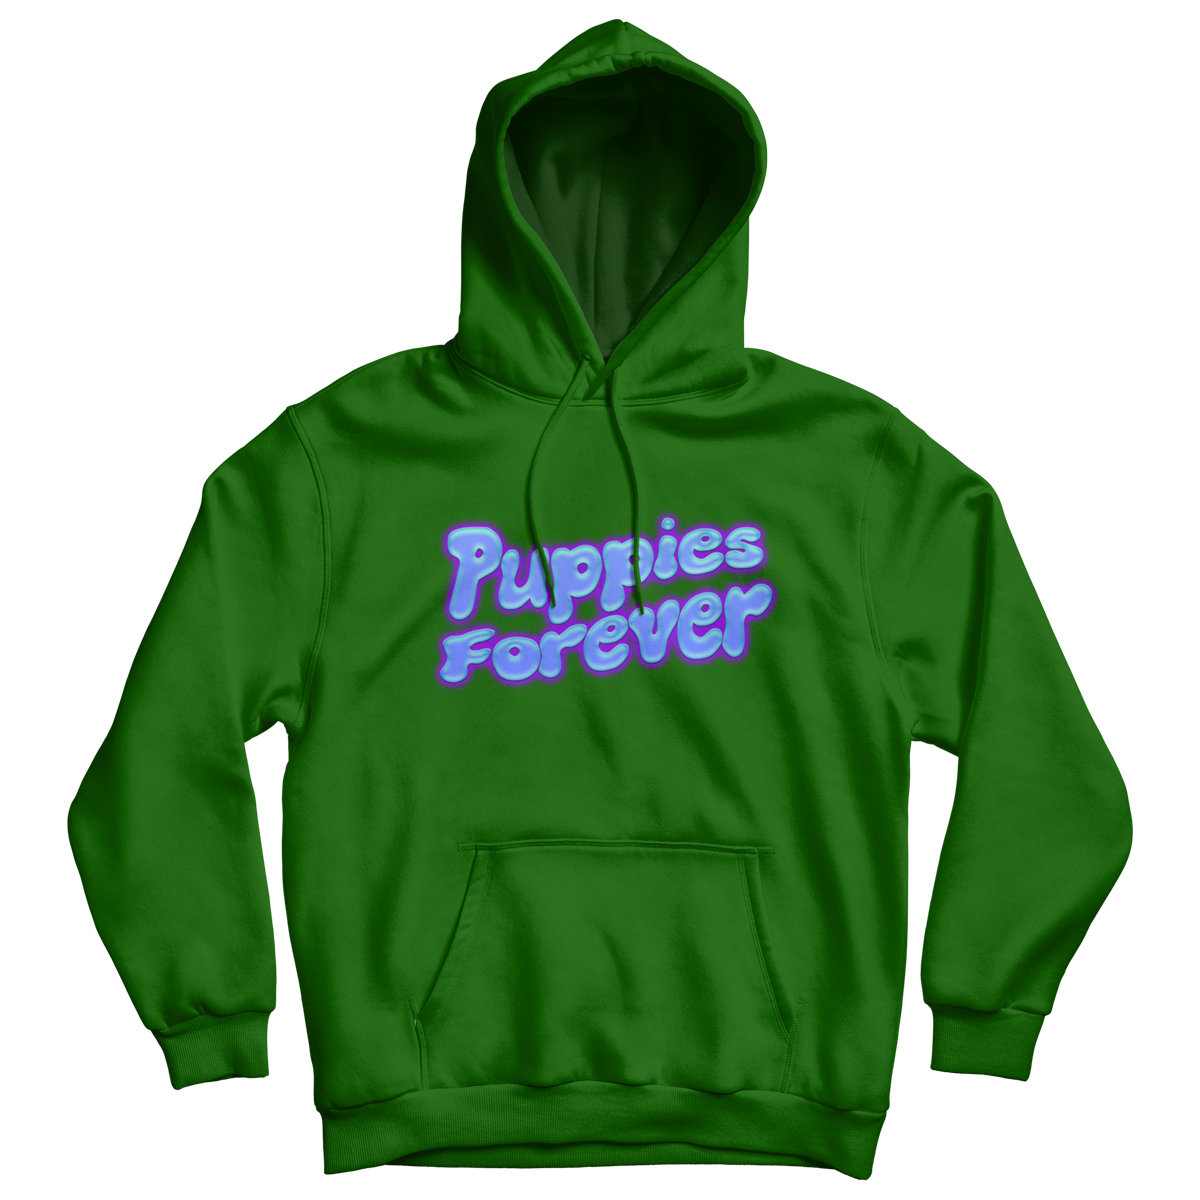 BLACKSTARKIDS: Puppies Forever Green Hoodie